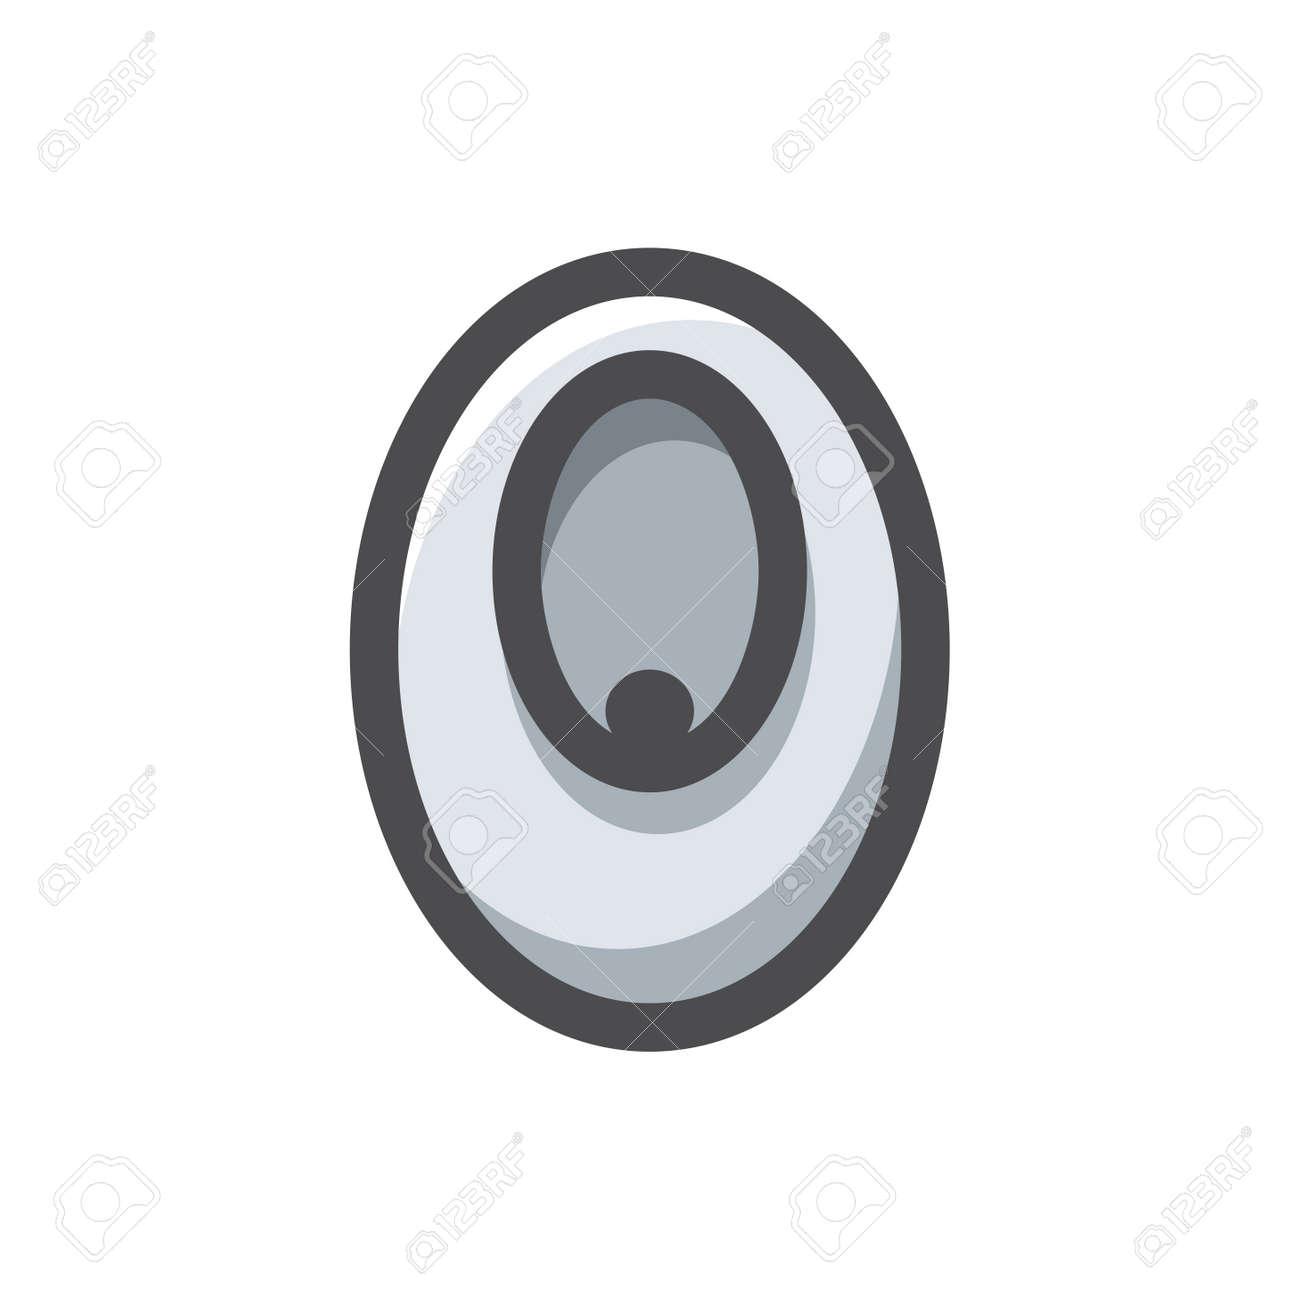 Urinal sanitary engineering Vector icon Cartoon illustration. - 171392923